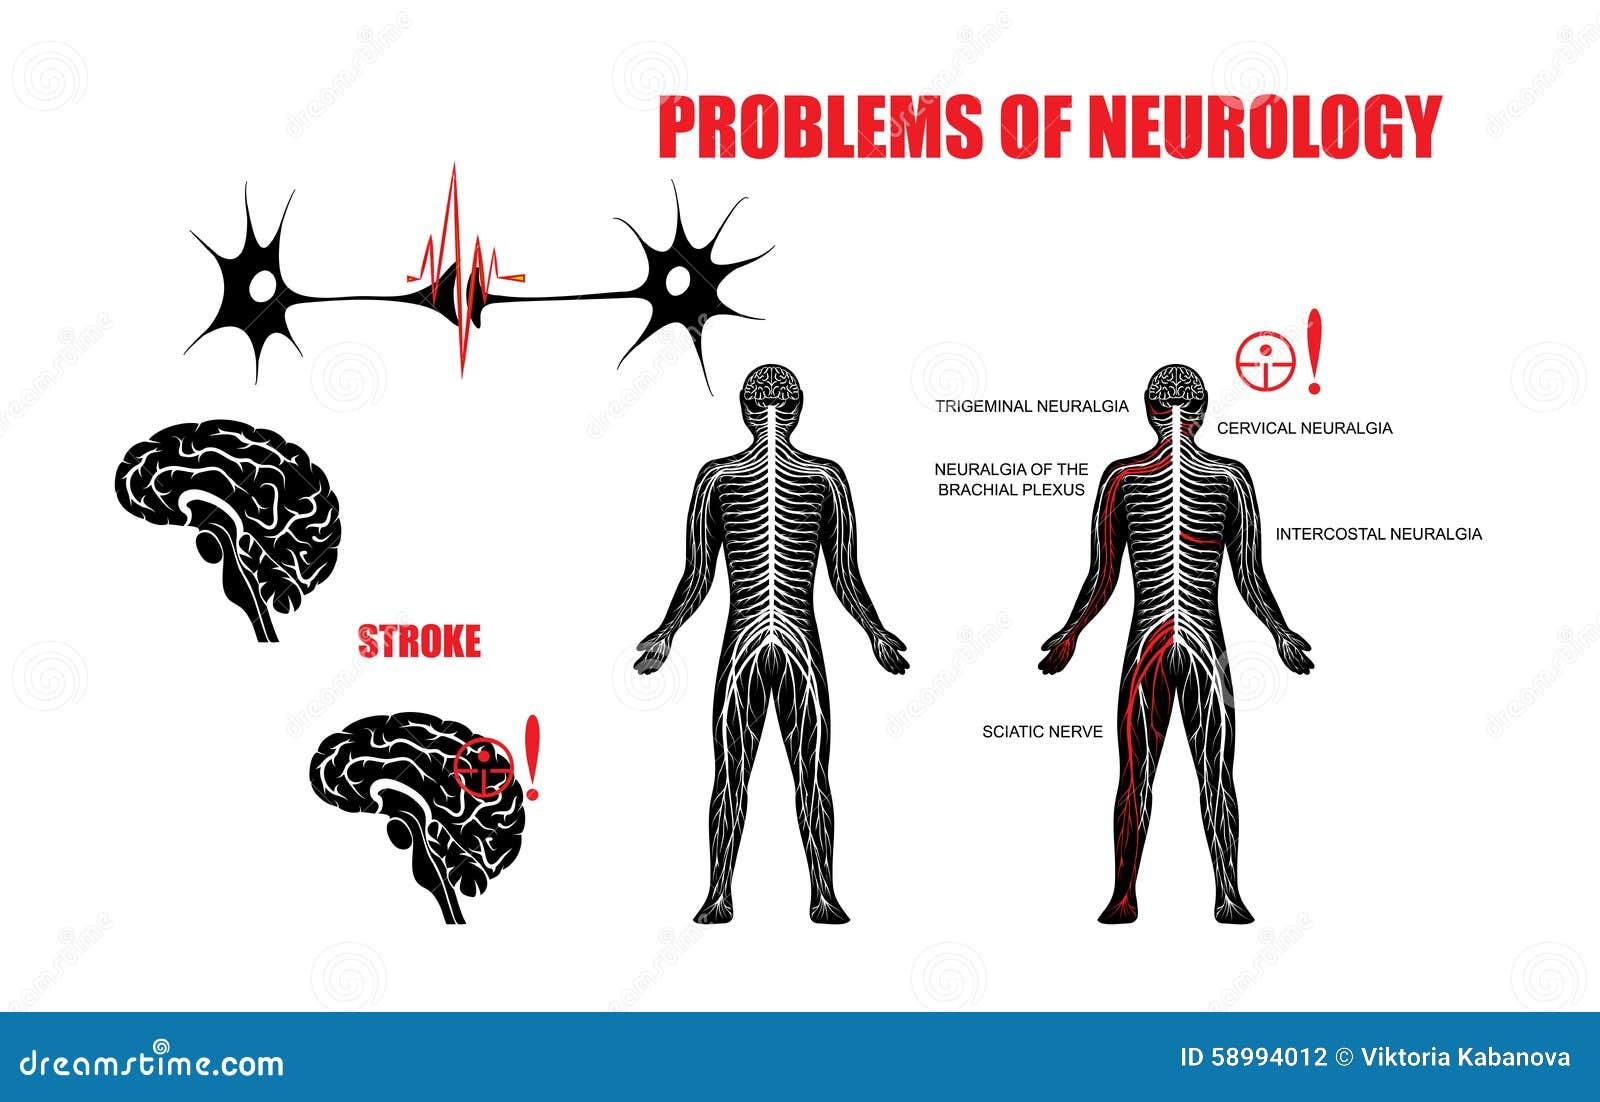 anatomical brain illustration